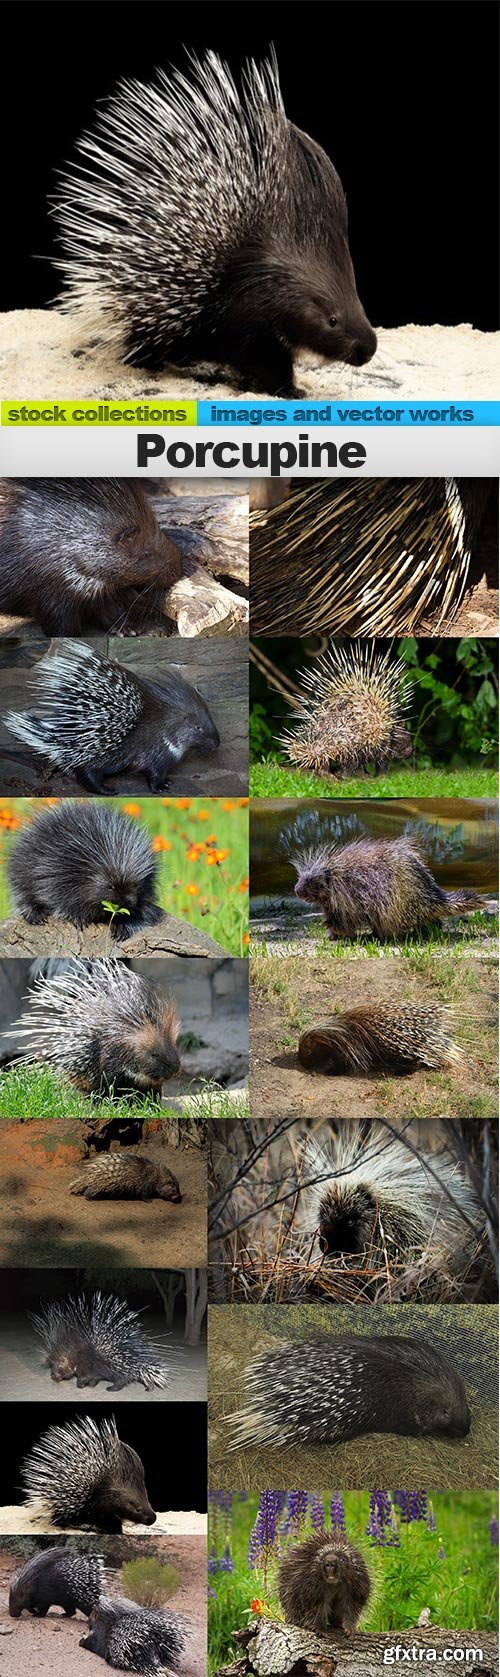 Porcupine, 15 x UHQ JPEG